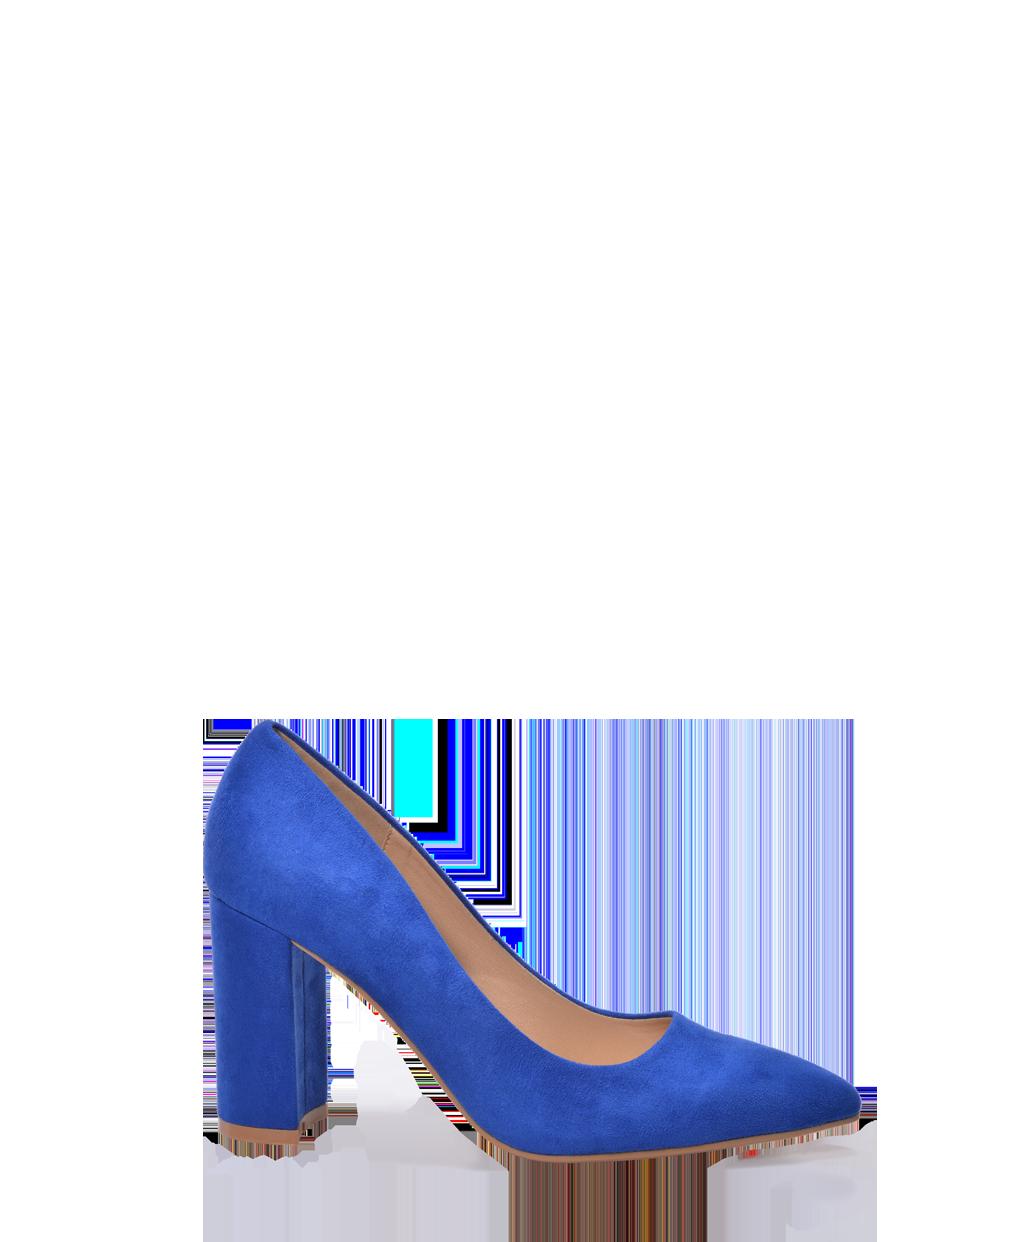 Zapatos Mujer2019De Marypaz Mujer2019De Zapatos Marypaz Marypaz Zapatos Marypaz Mujer2019De Zapatos Mujer2019De FTculK5J31